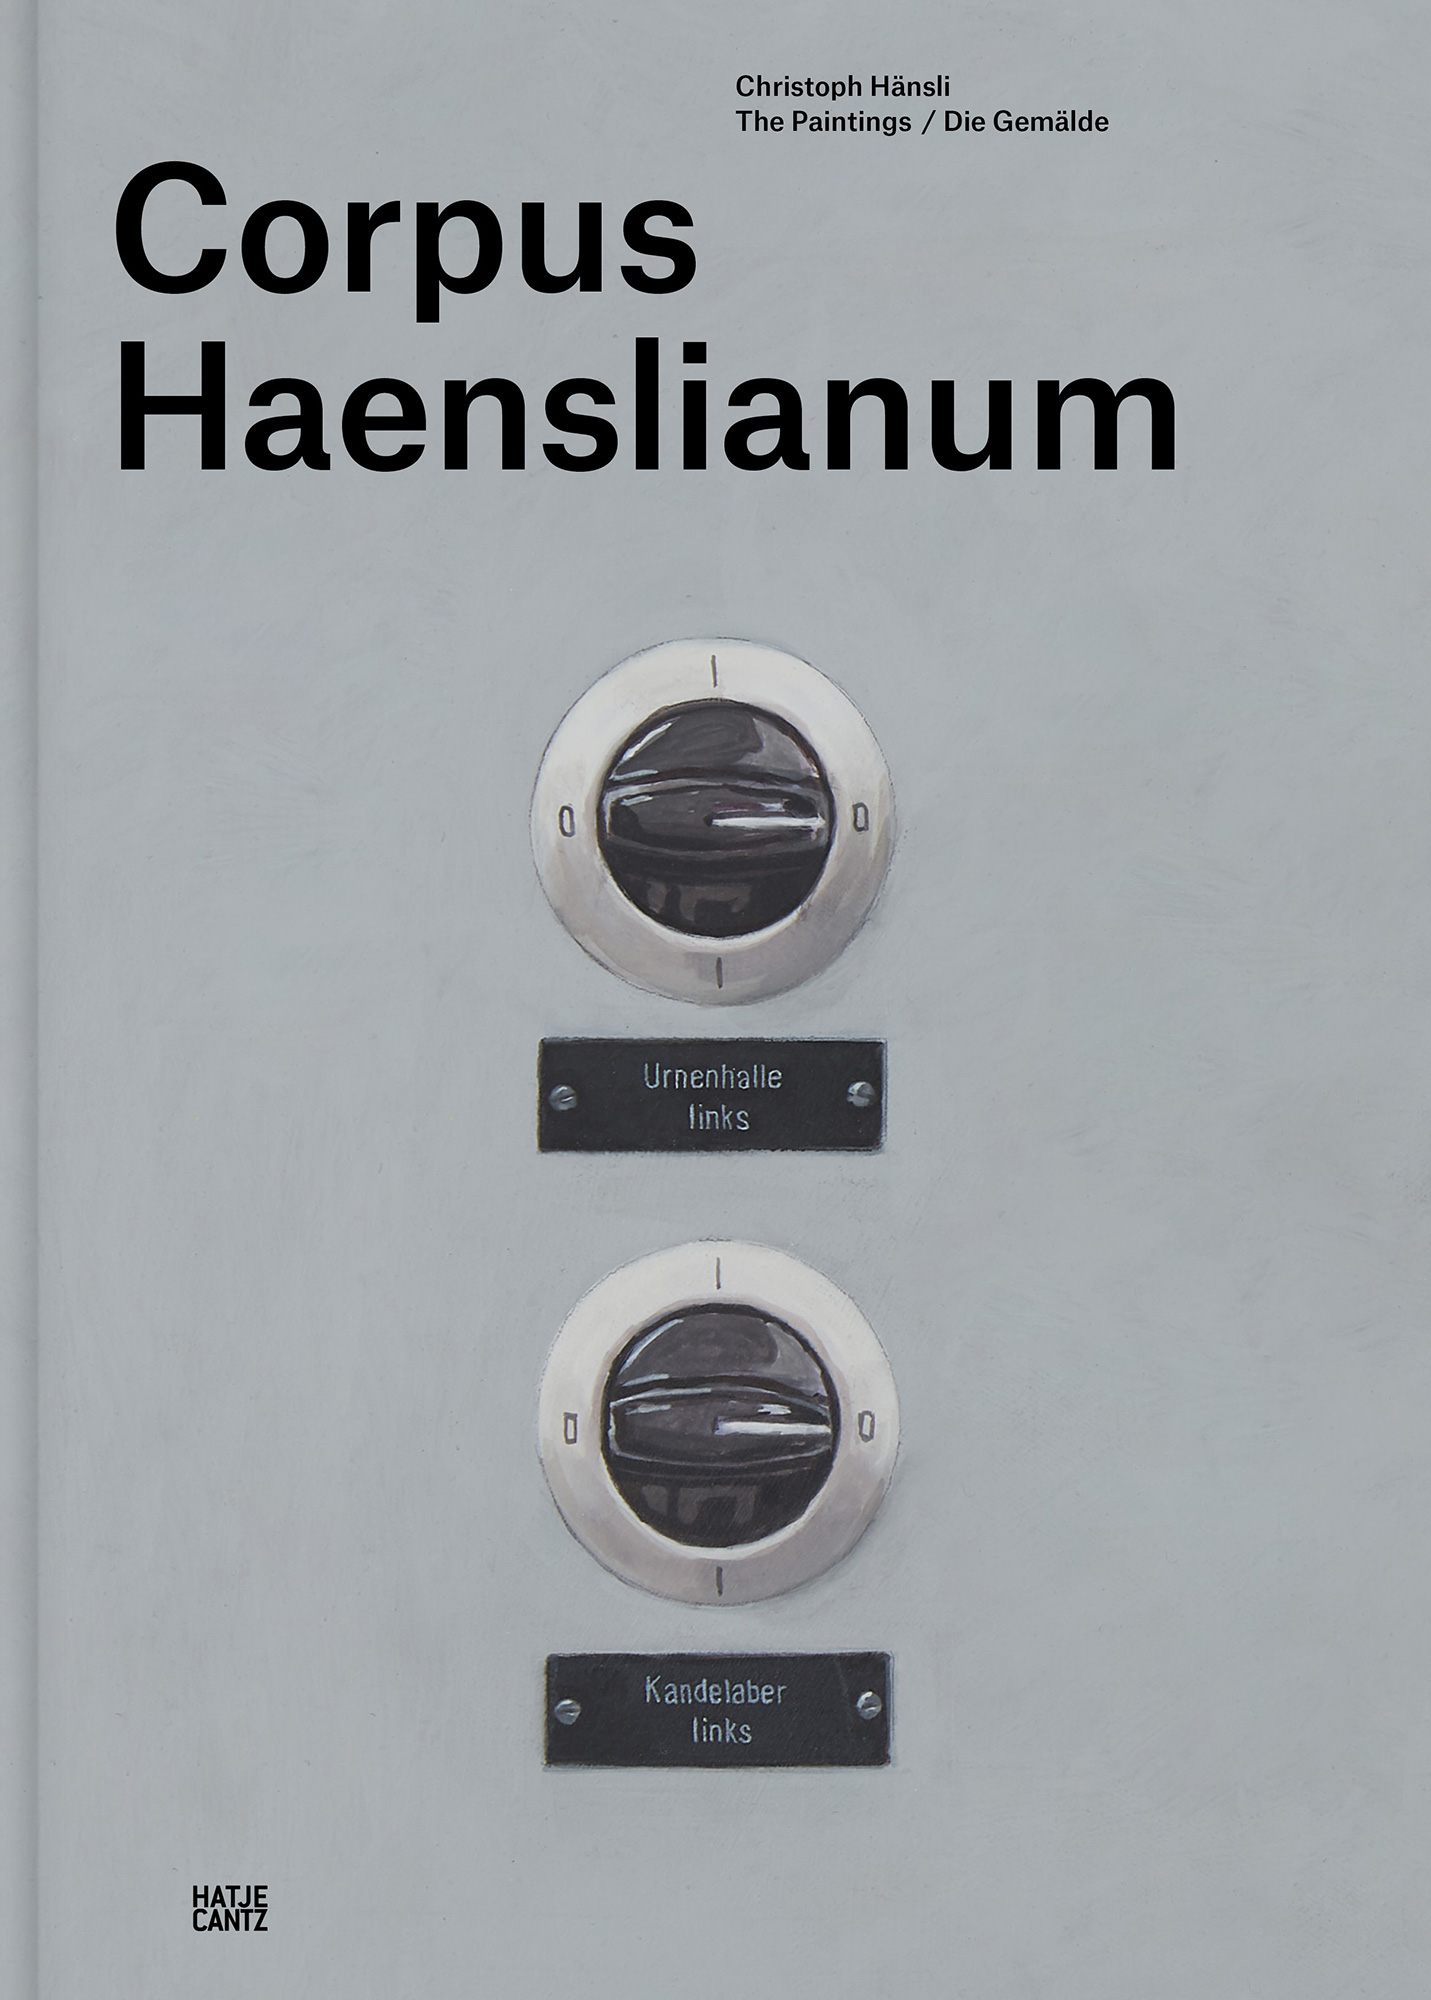 Christoph Hänsli Corpus Haenslianum Galerie Judin